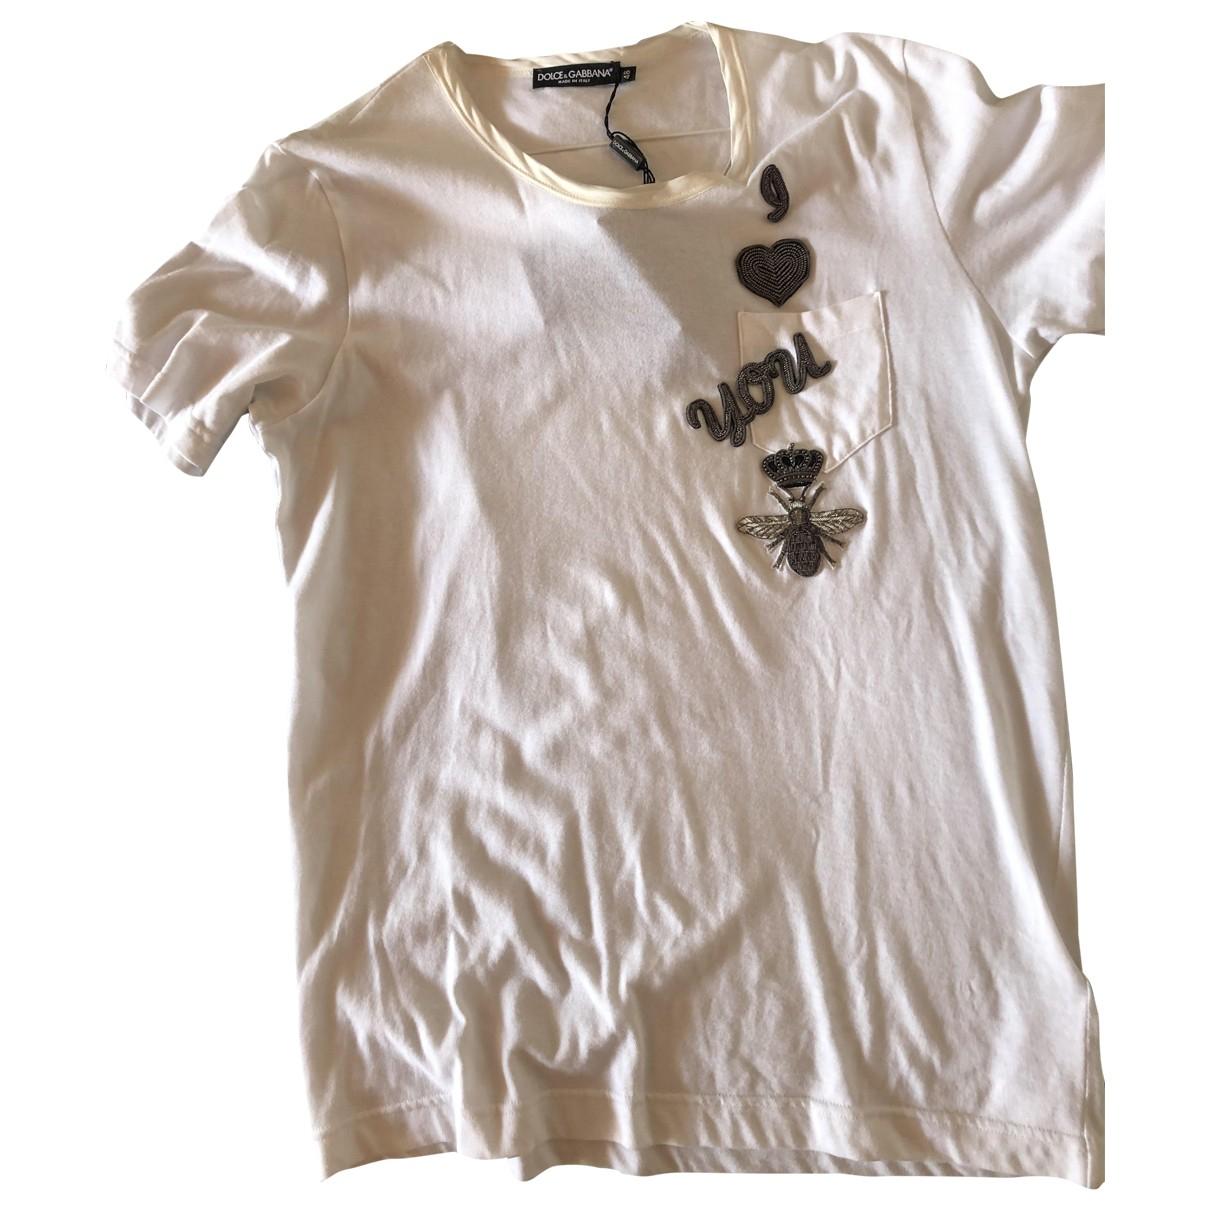 Dolce & Gabbana - Tee shirts   pour homme en coton - blanc